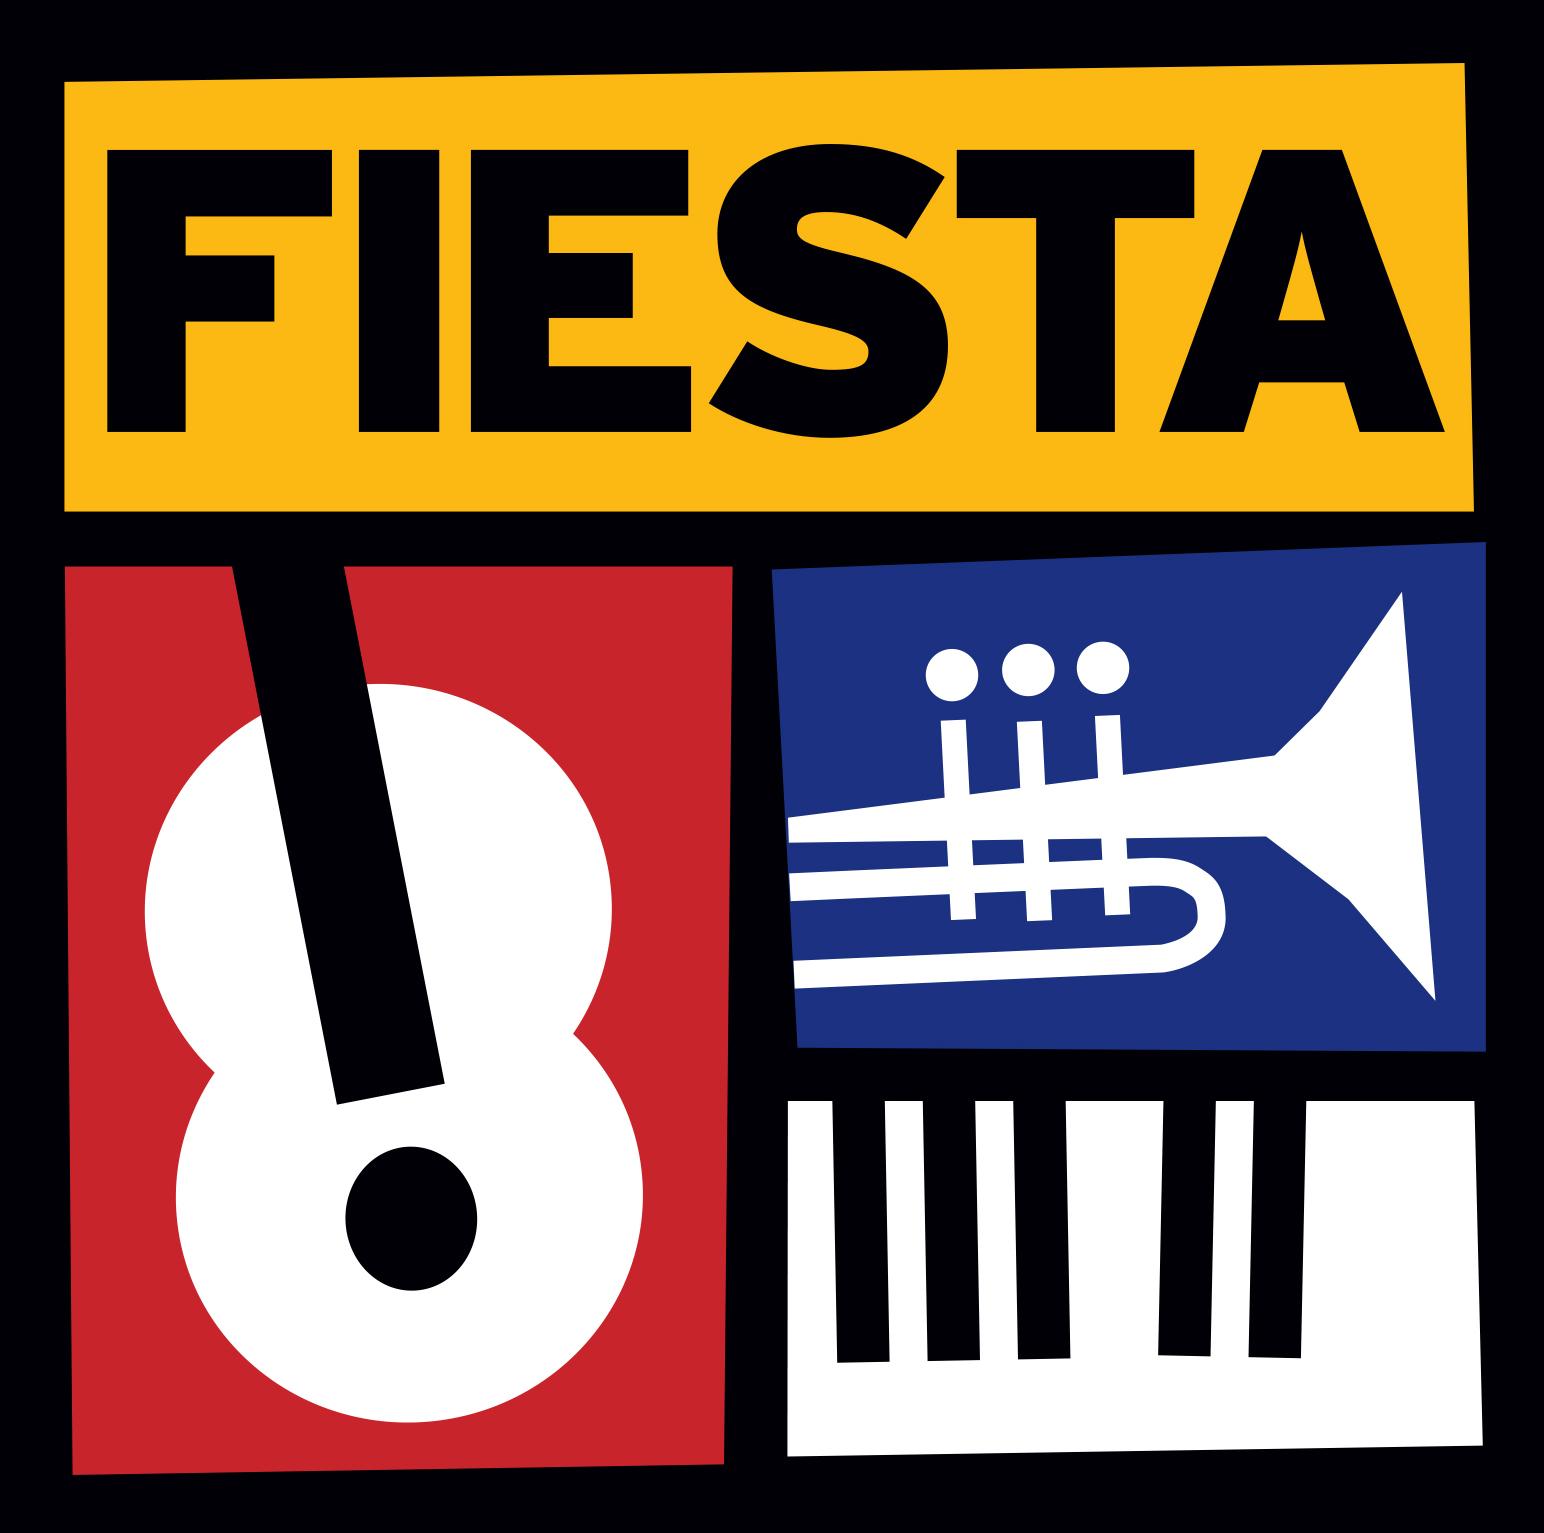 Fiesta_logo_02_012615_small